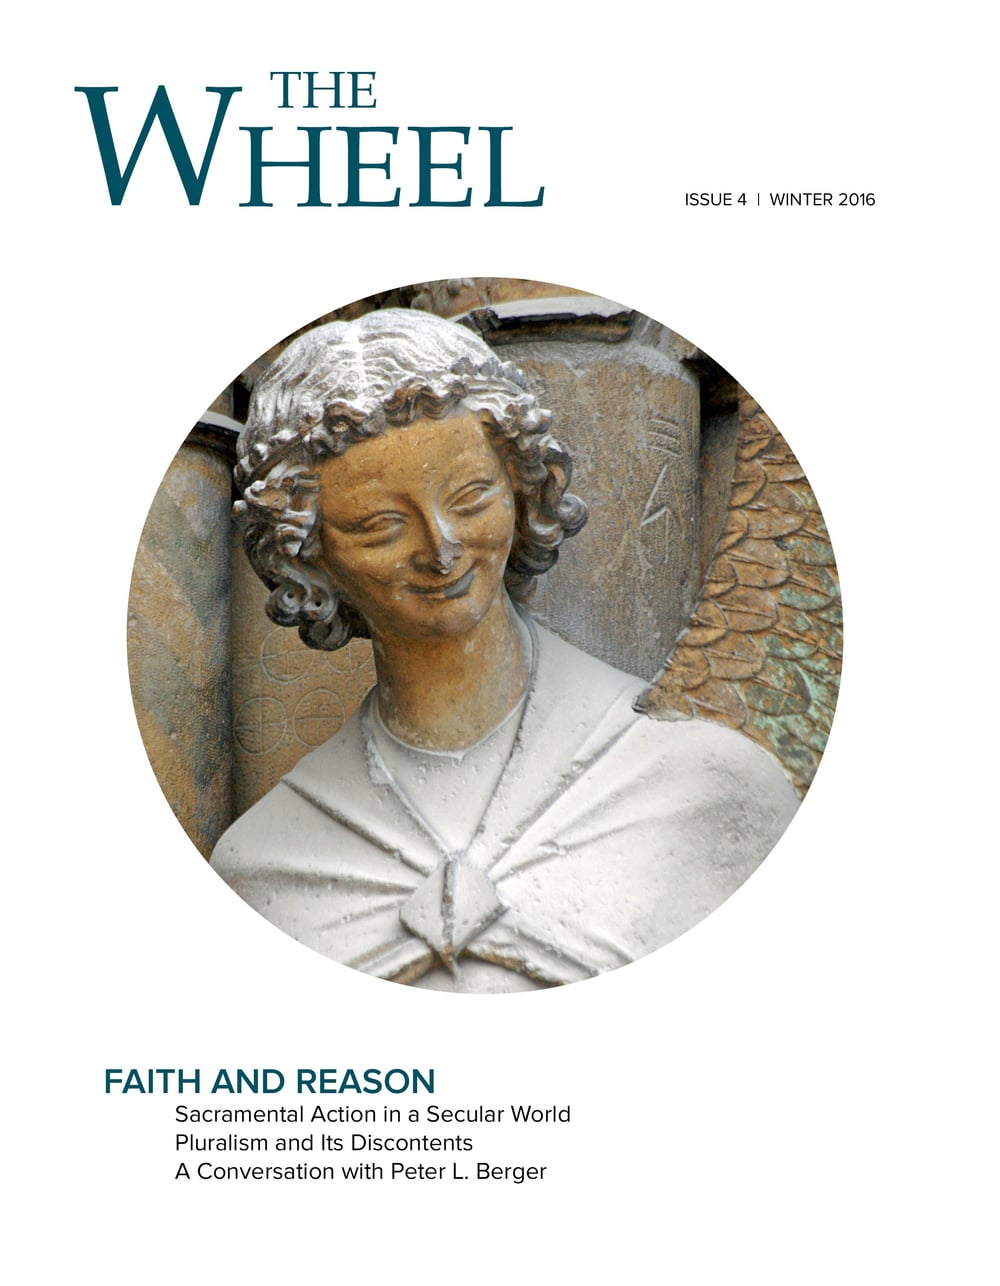 Wheel issue4 winter 2016.jpg